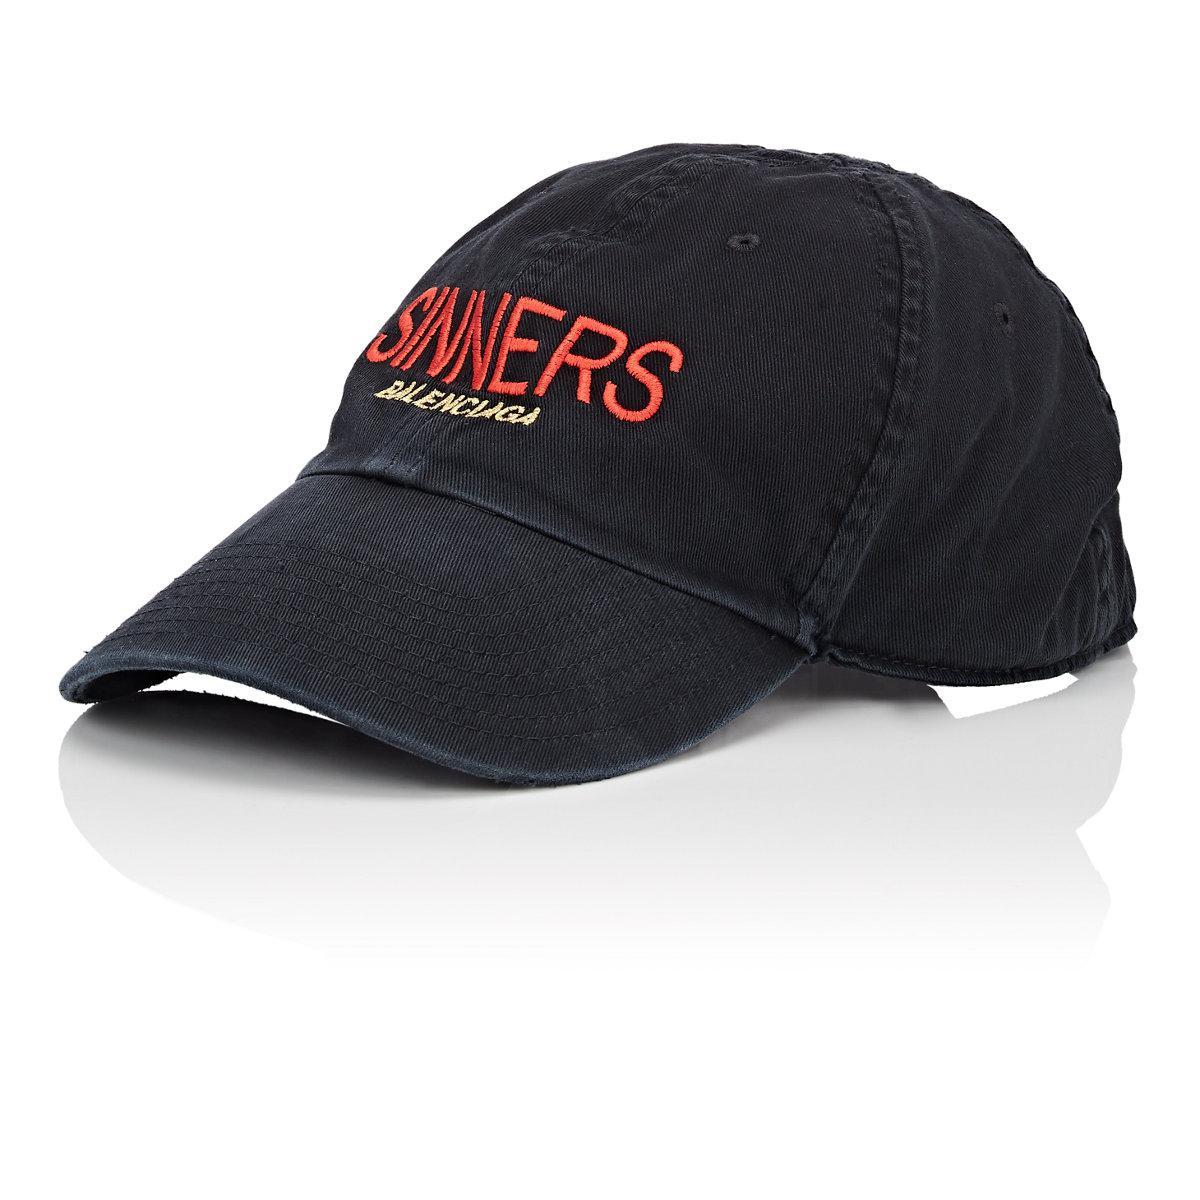 428ae0815be57 Balenciaga sinners Cotton Baseball Cap in Black for Men - Lyst